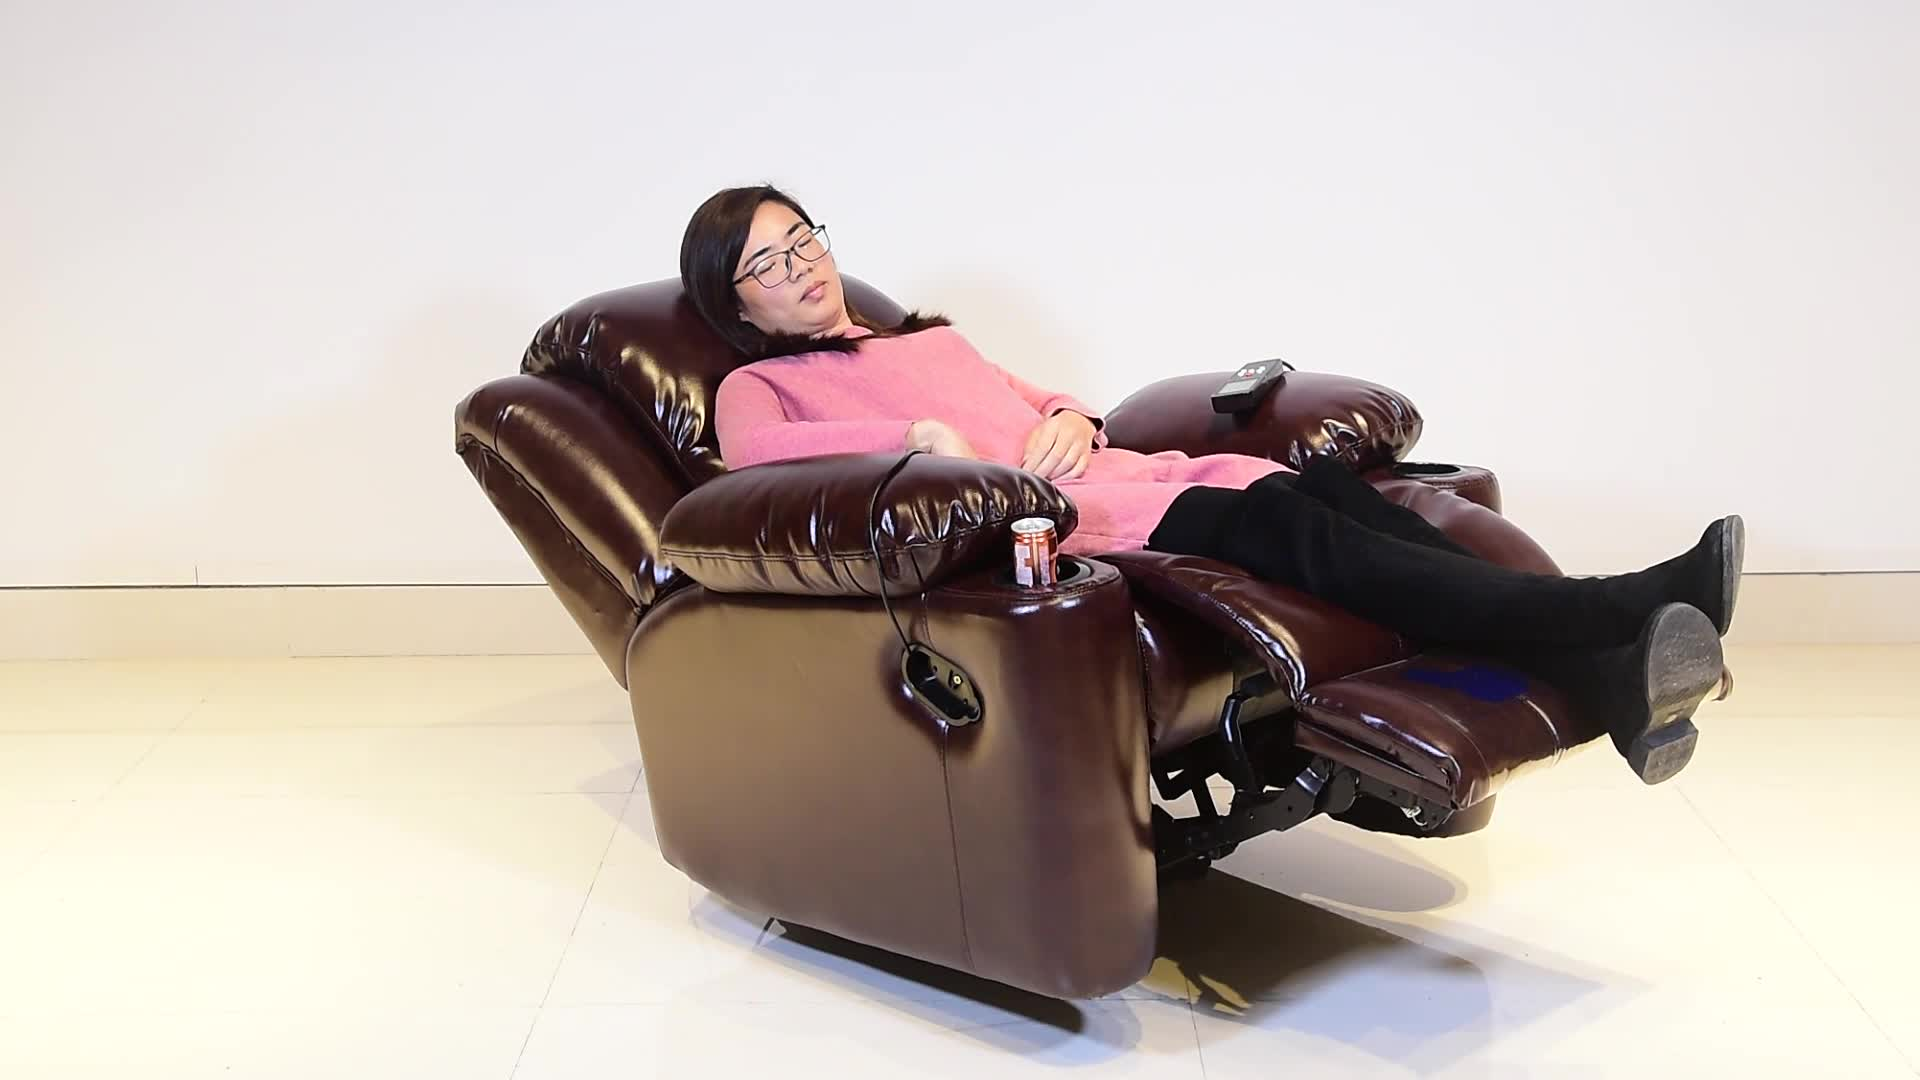 Modern luxury home theater cinema furniture single lift swivel rocker mechanism massage electric genuine leather recliner chair